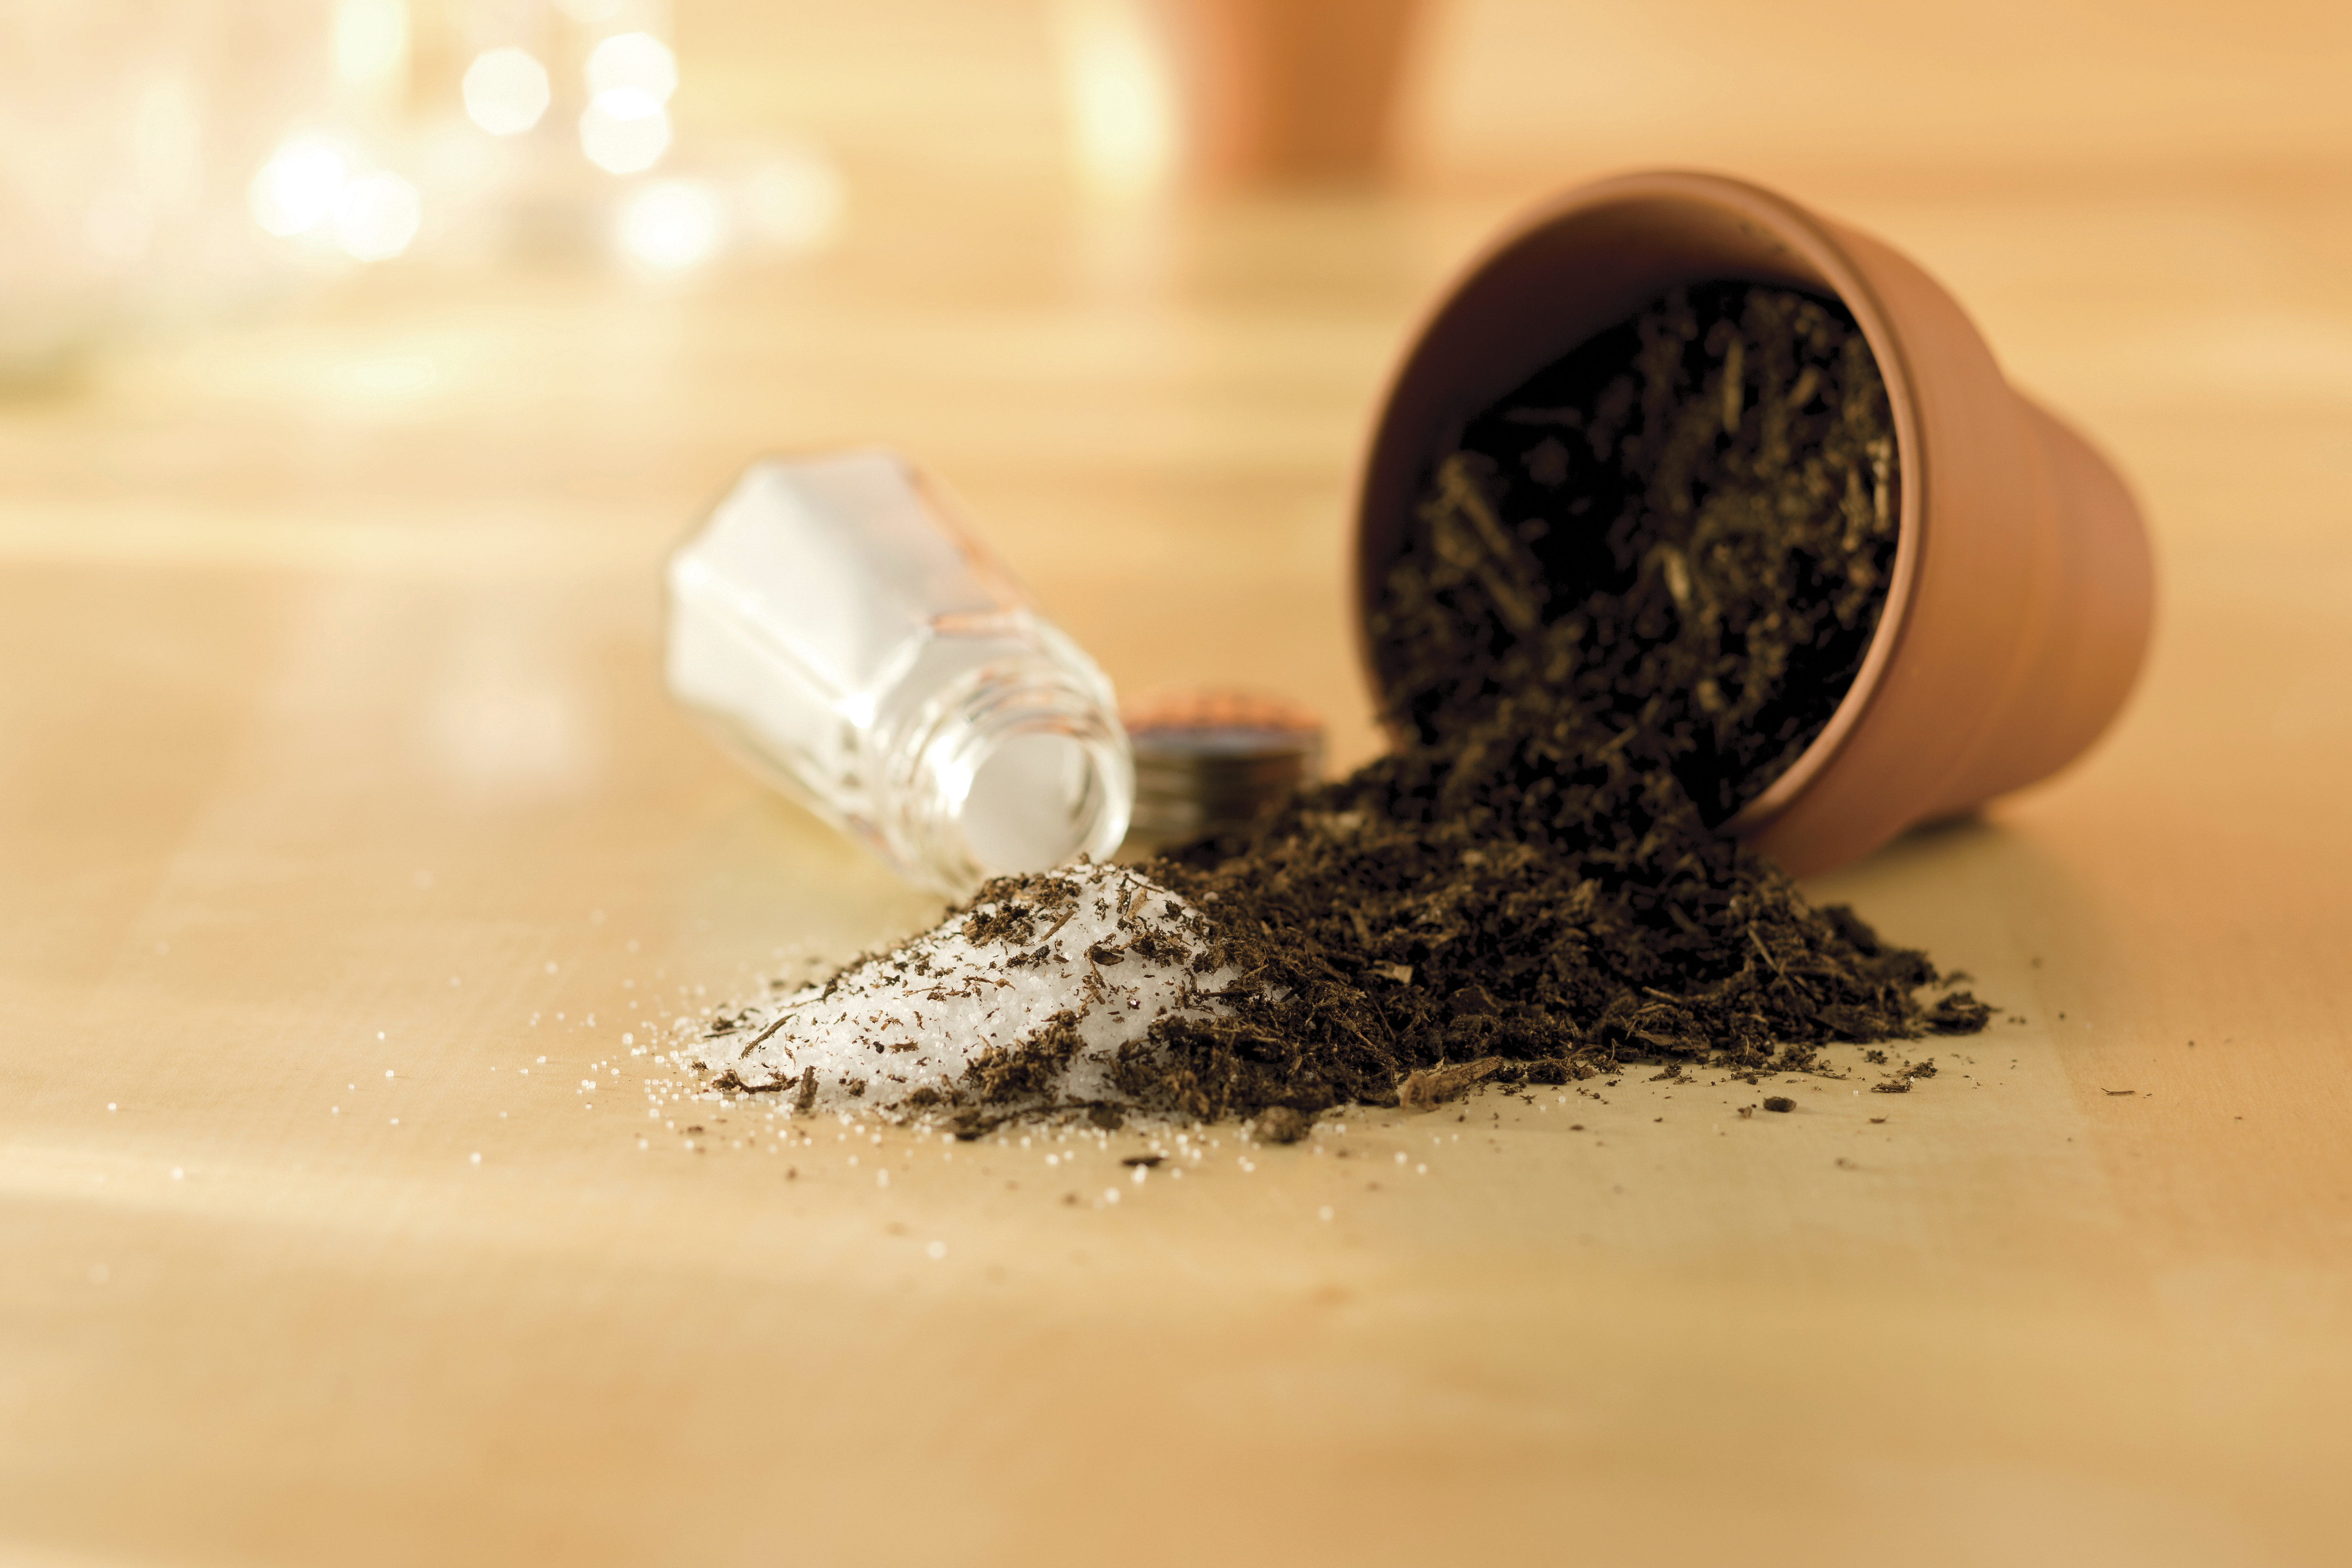 A conceptual photograph of salt mixing with dirt.